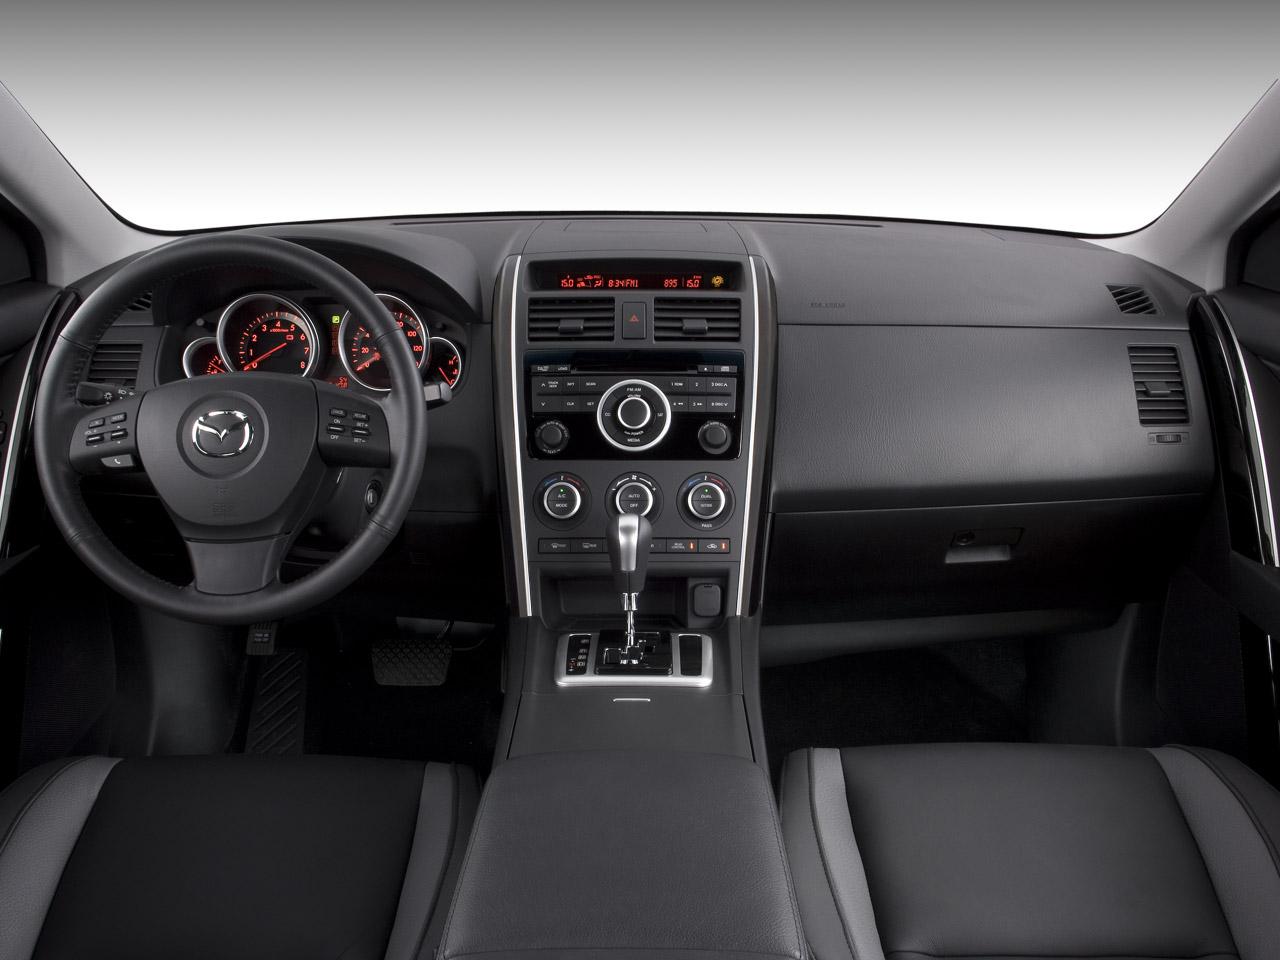 DRIVEN PREVIEW: 2007 Mazda CX-9 - Latest Reviews, Road ...